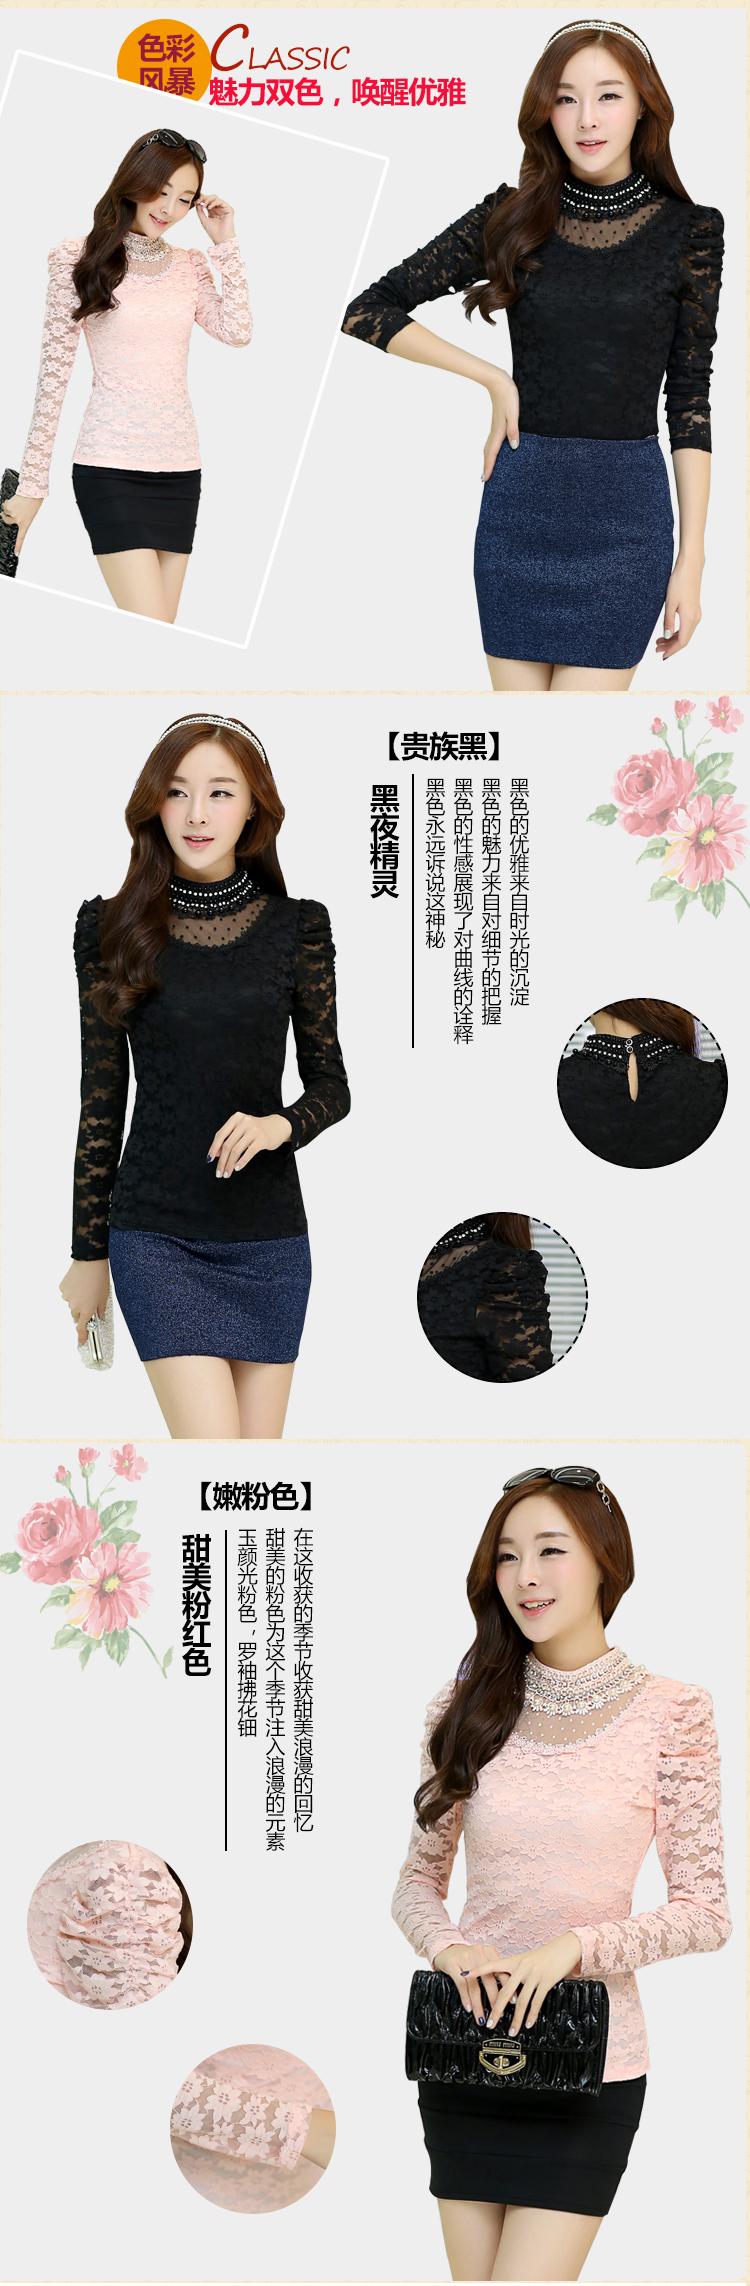 Áo kiểu ren tay dài gợi cảm kiểu Hàn